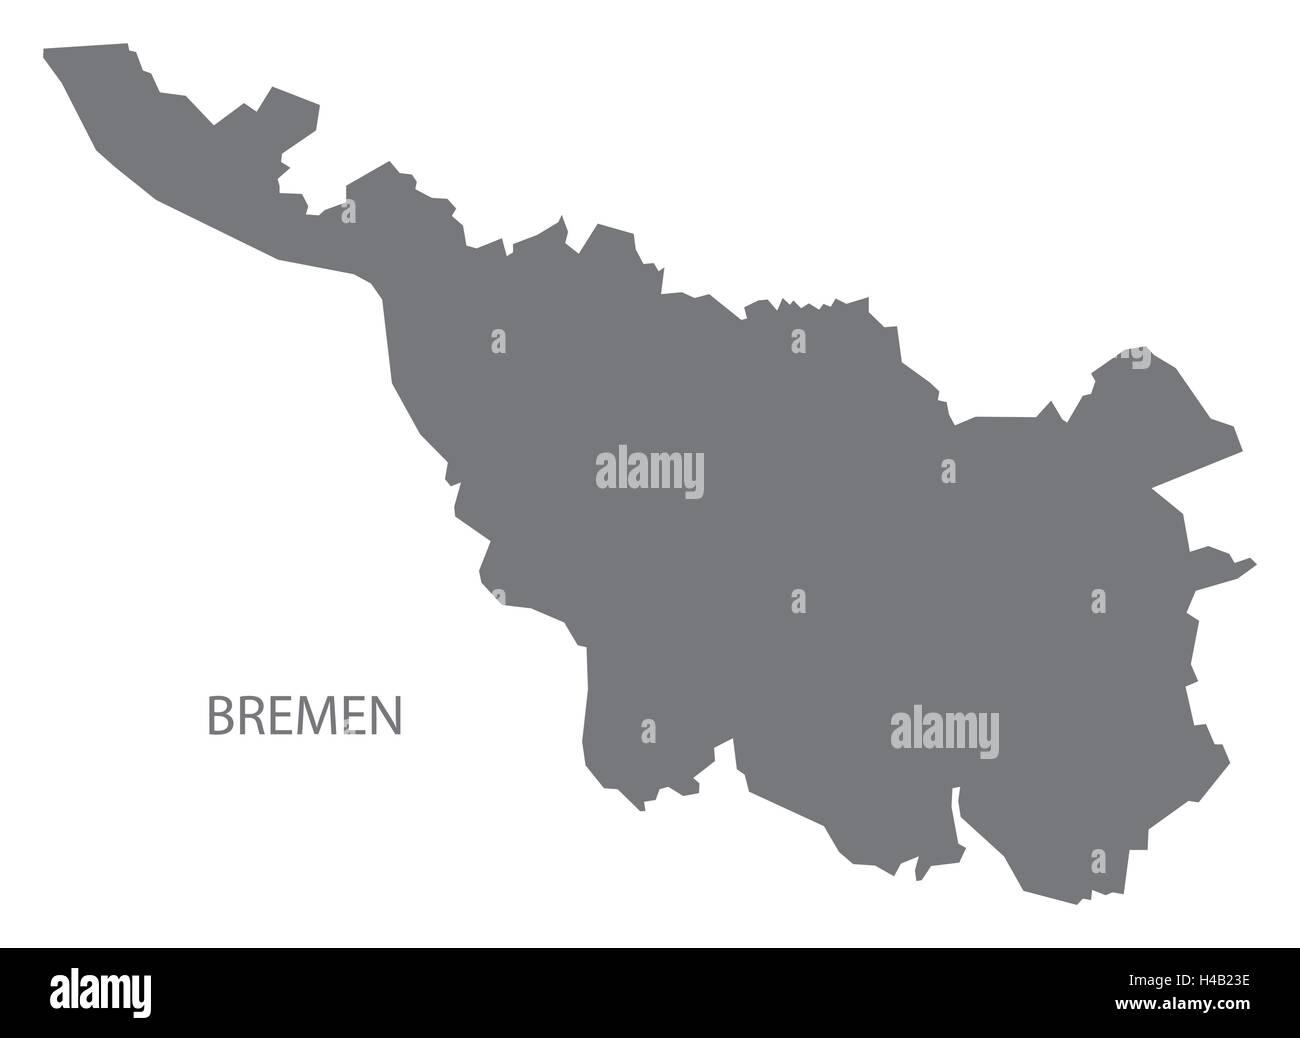 Bremen Germany Map Grey Stock Vector Art Illustration Vector